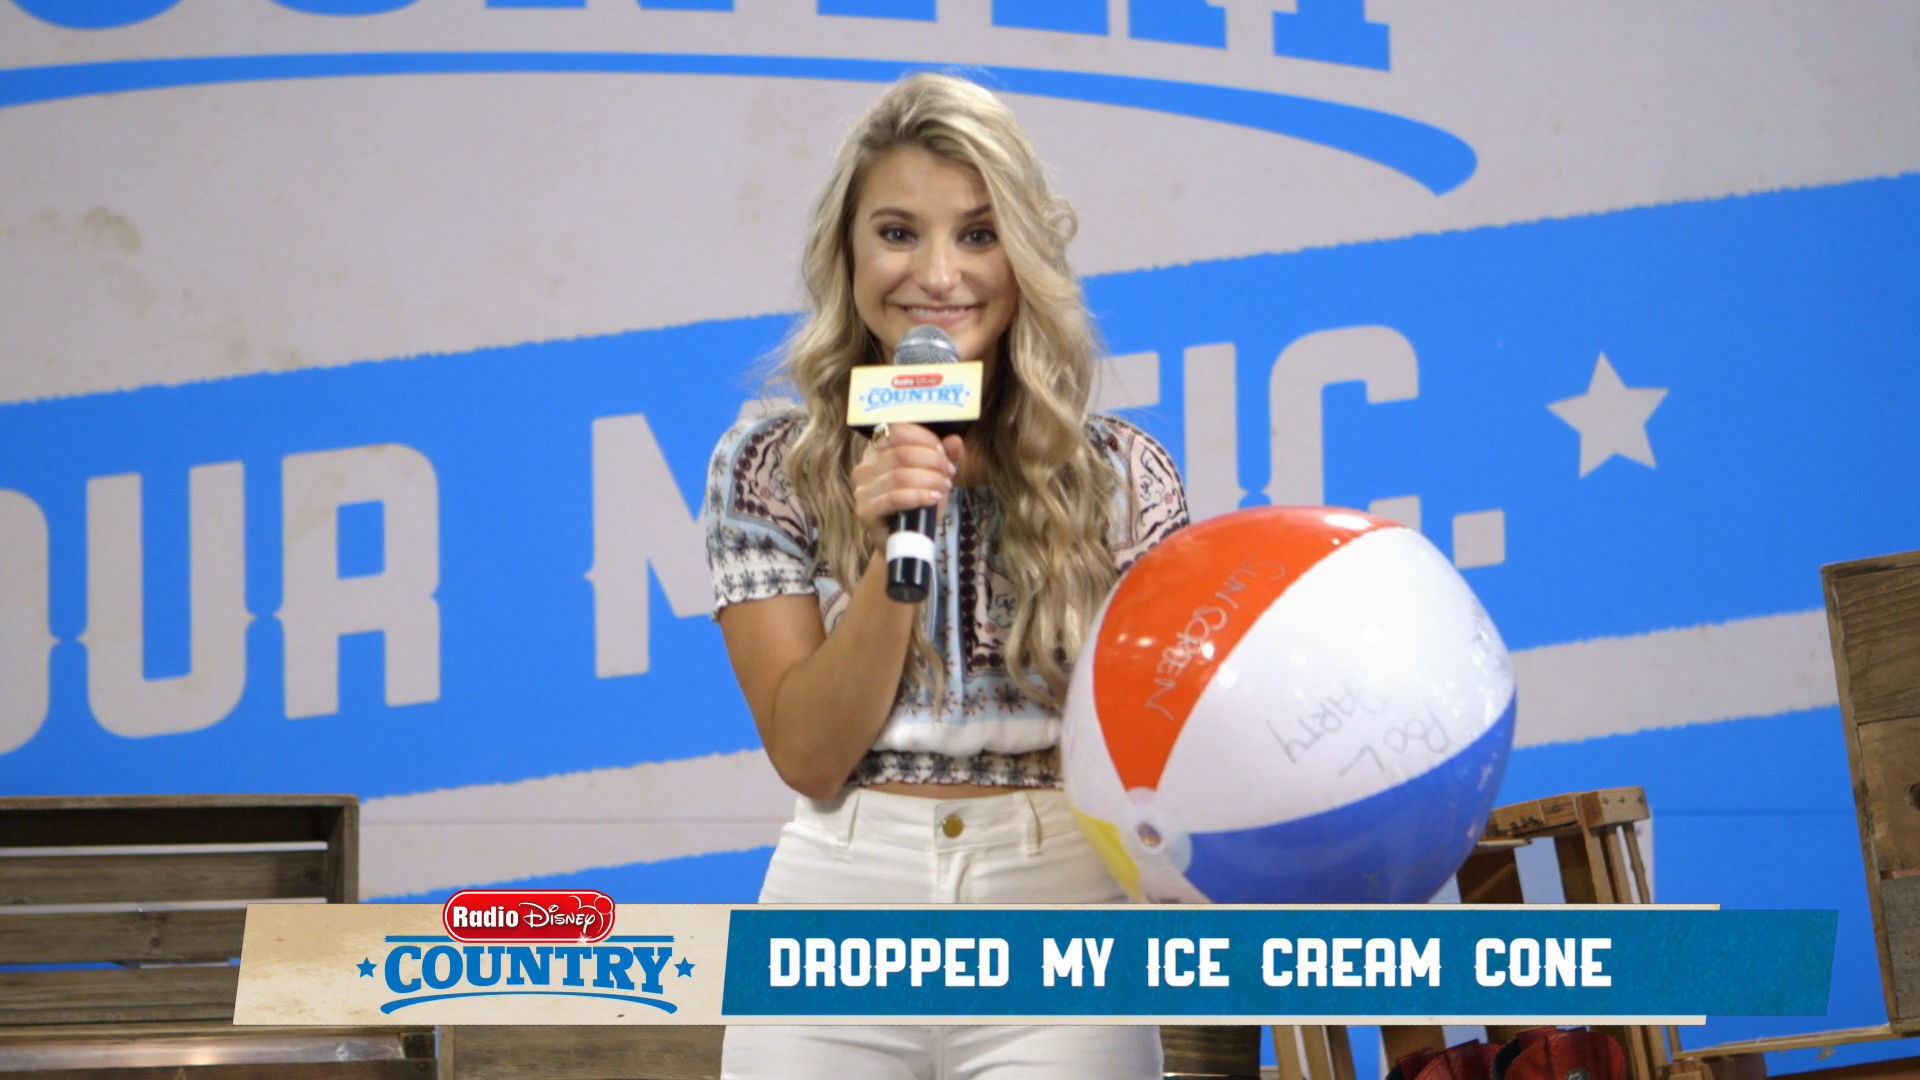 April Kry - Beach Ball Song Challenge | Radio Disney Country